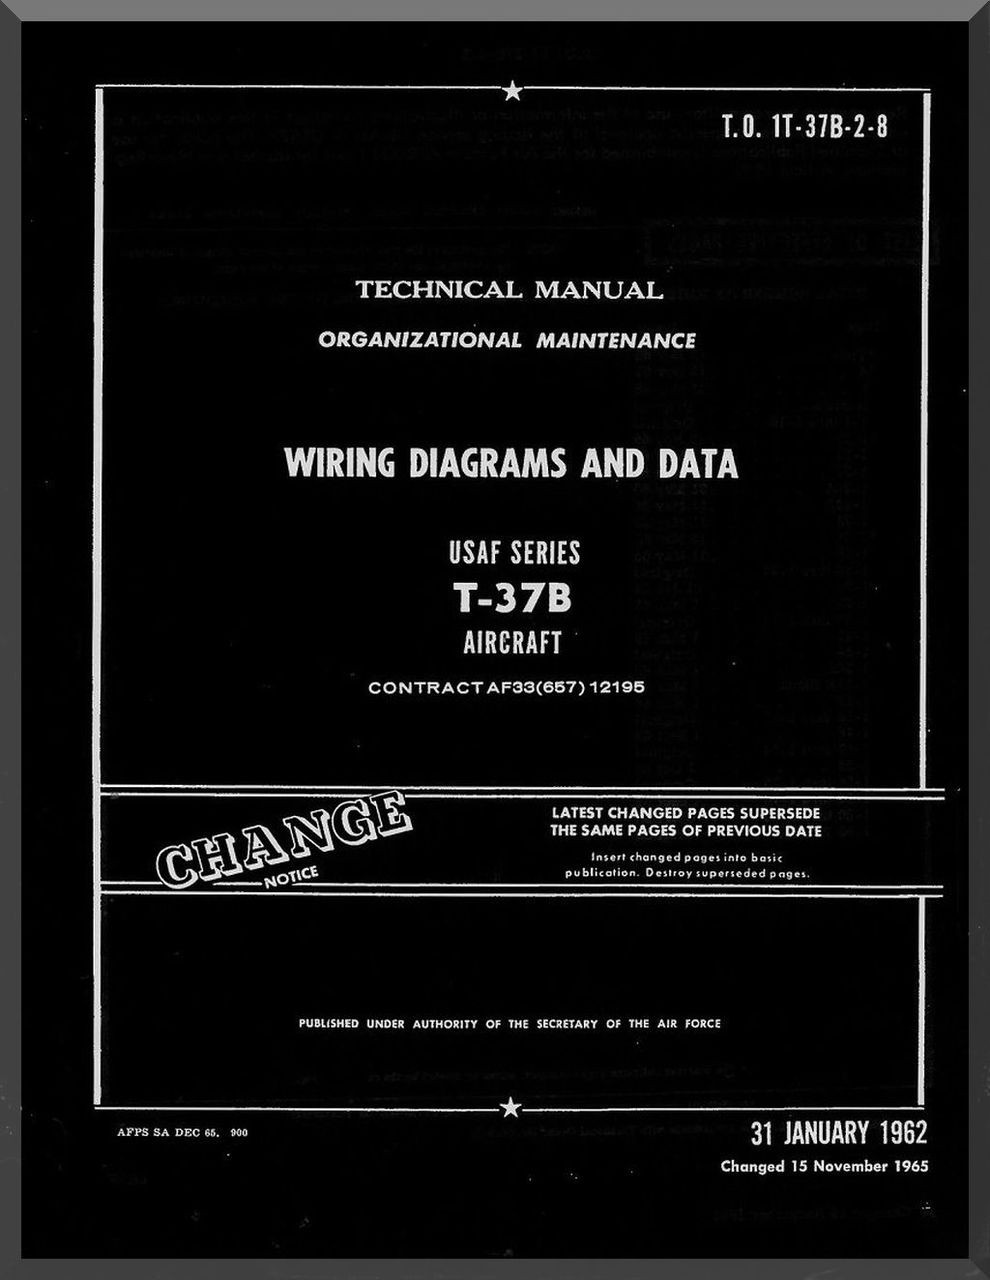 cessna t 37 b aircraft organizational maintenance manual wiring Vehicle Wiring Diagrams categories